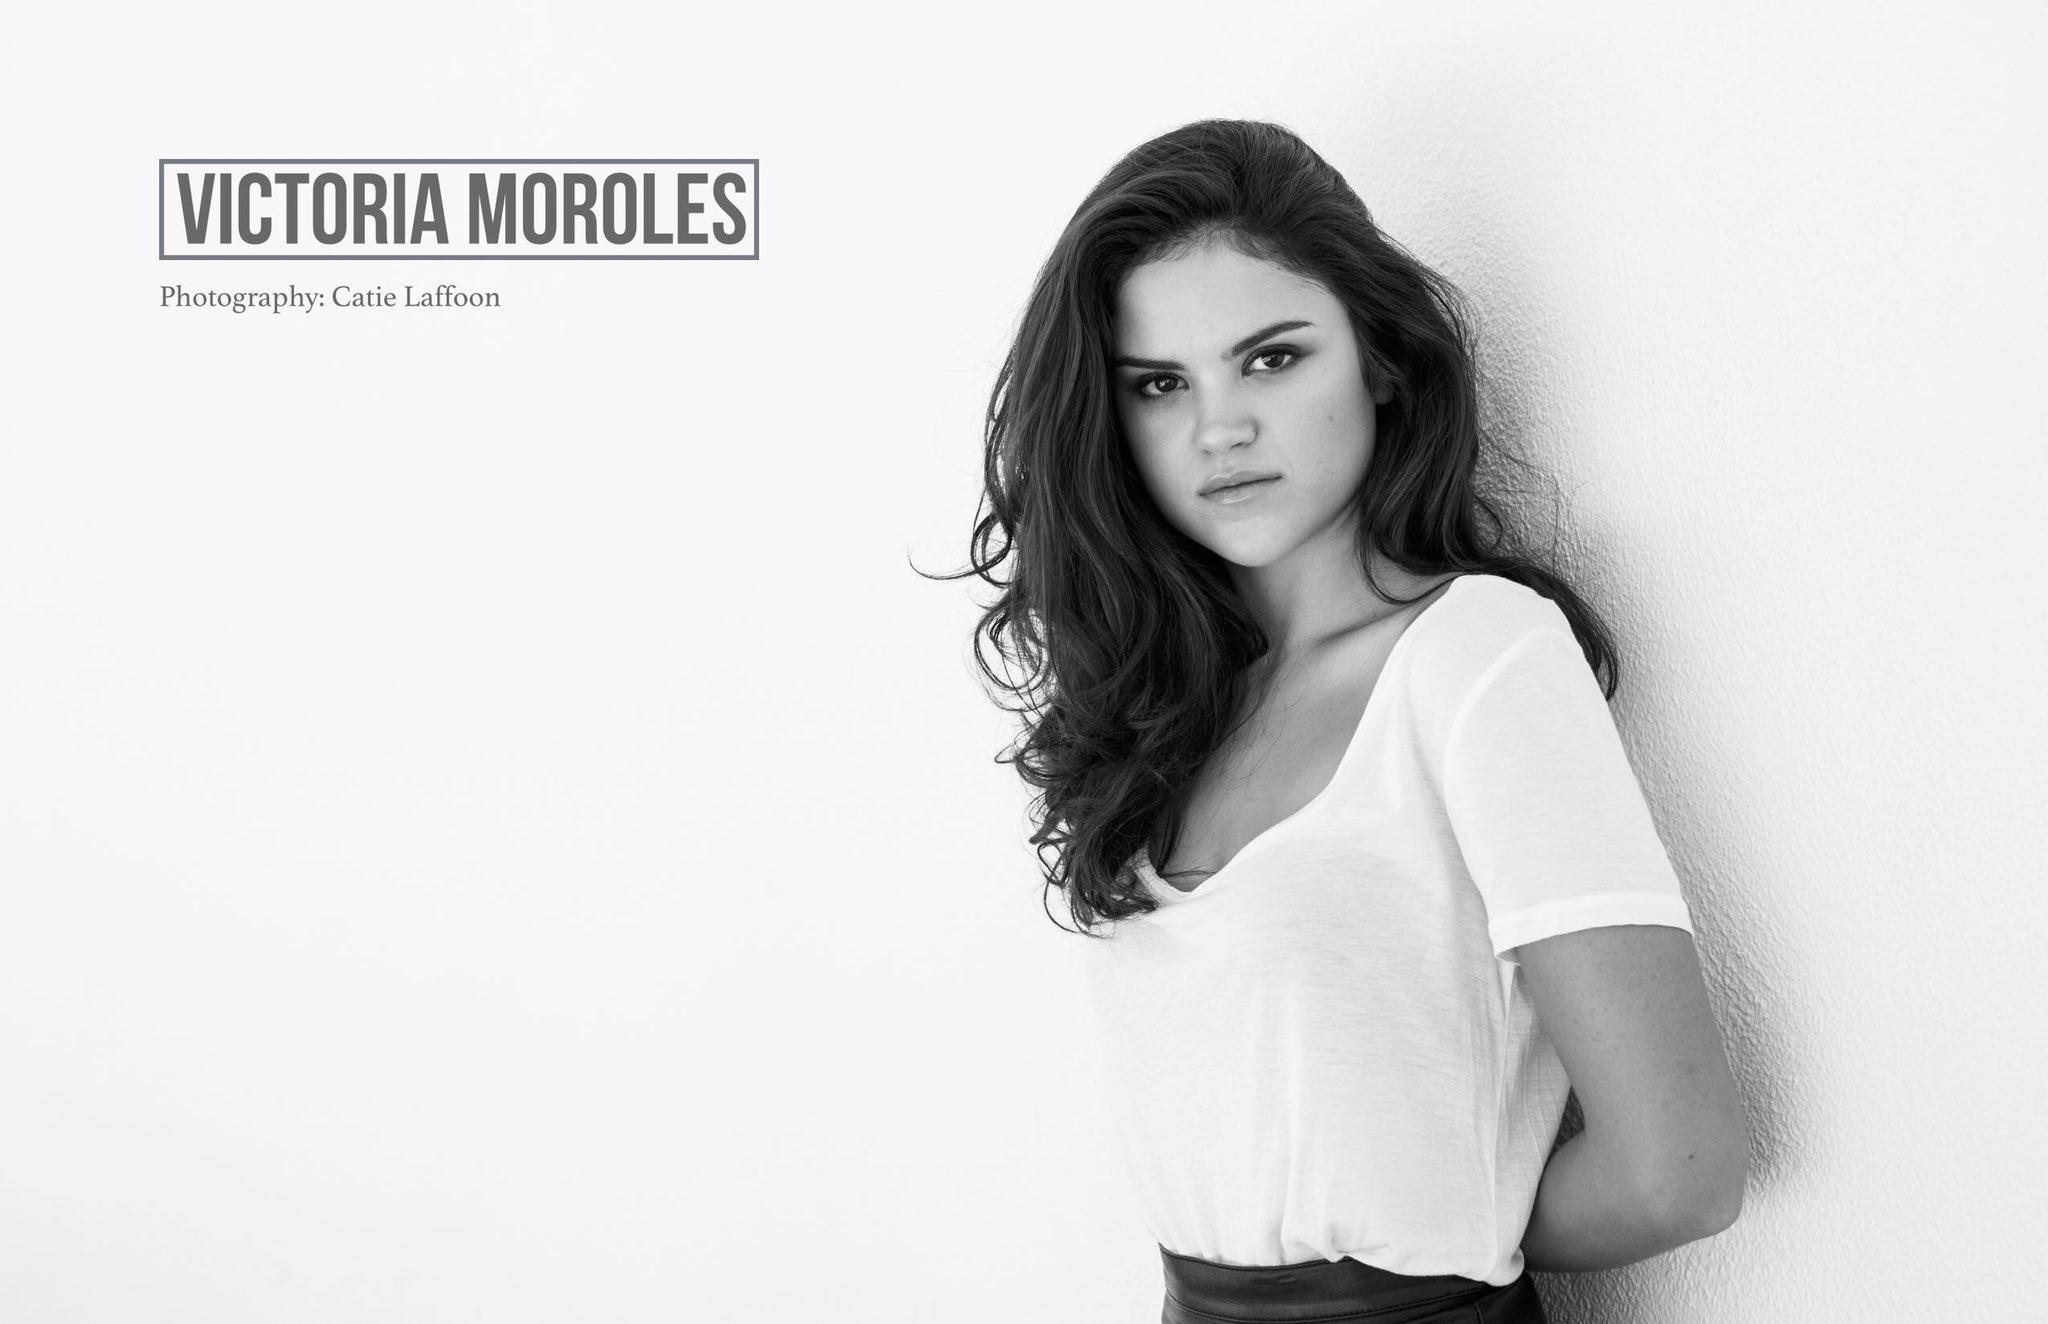 Forum on this topic: Flora Morris, natalie-dormer/